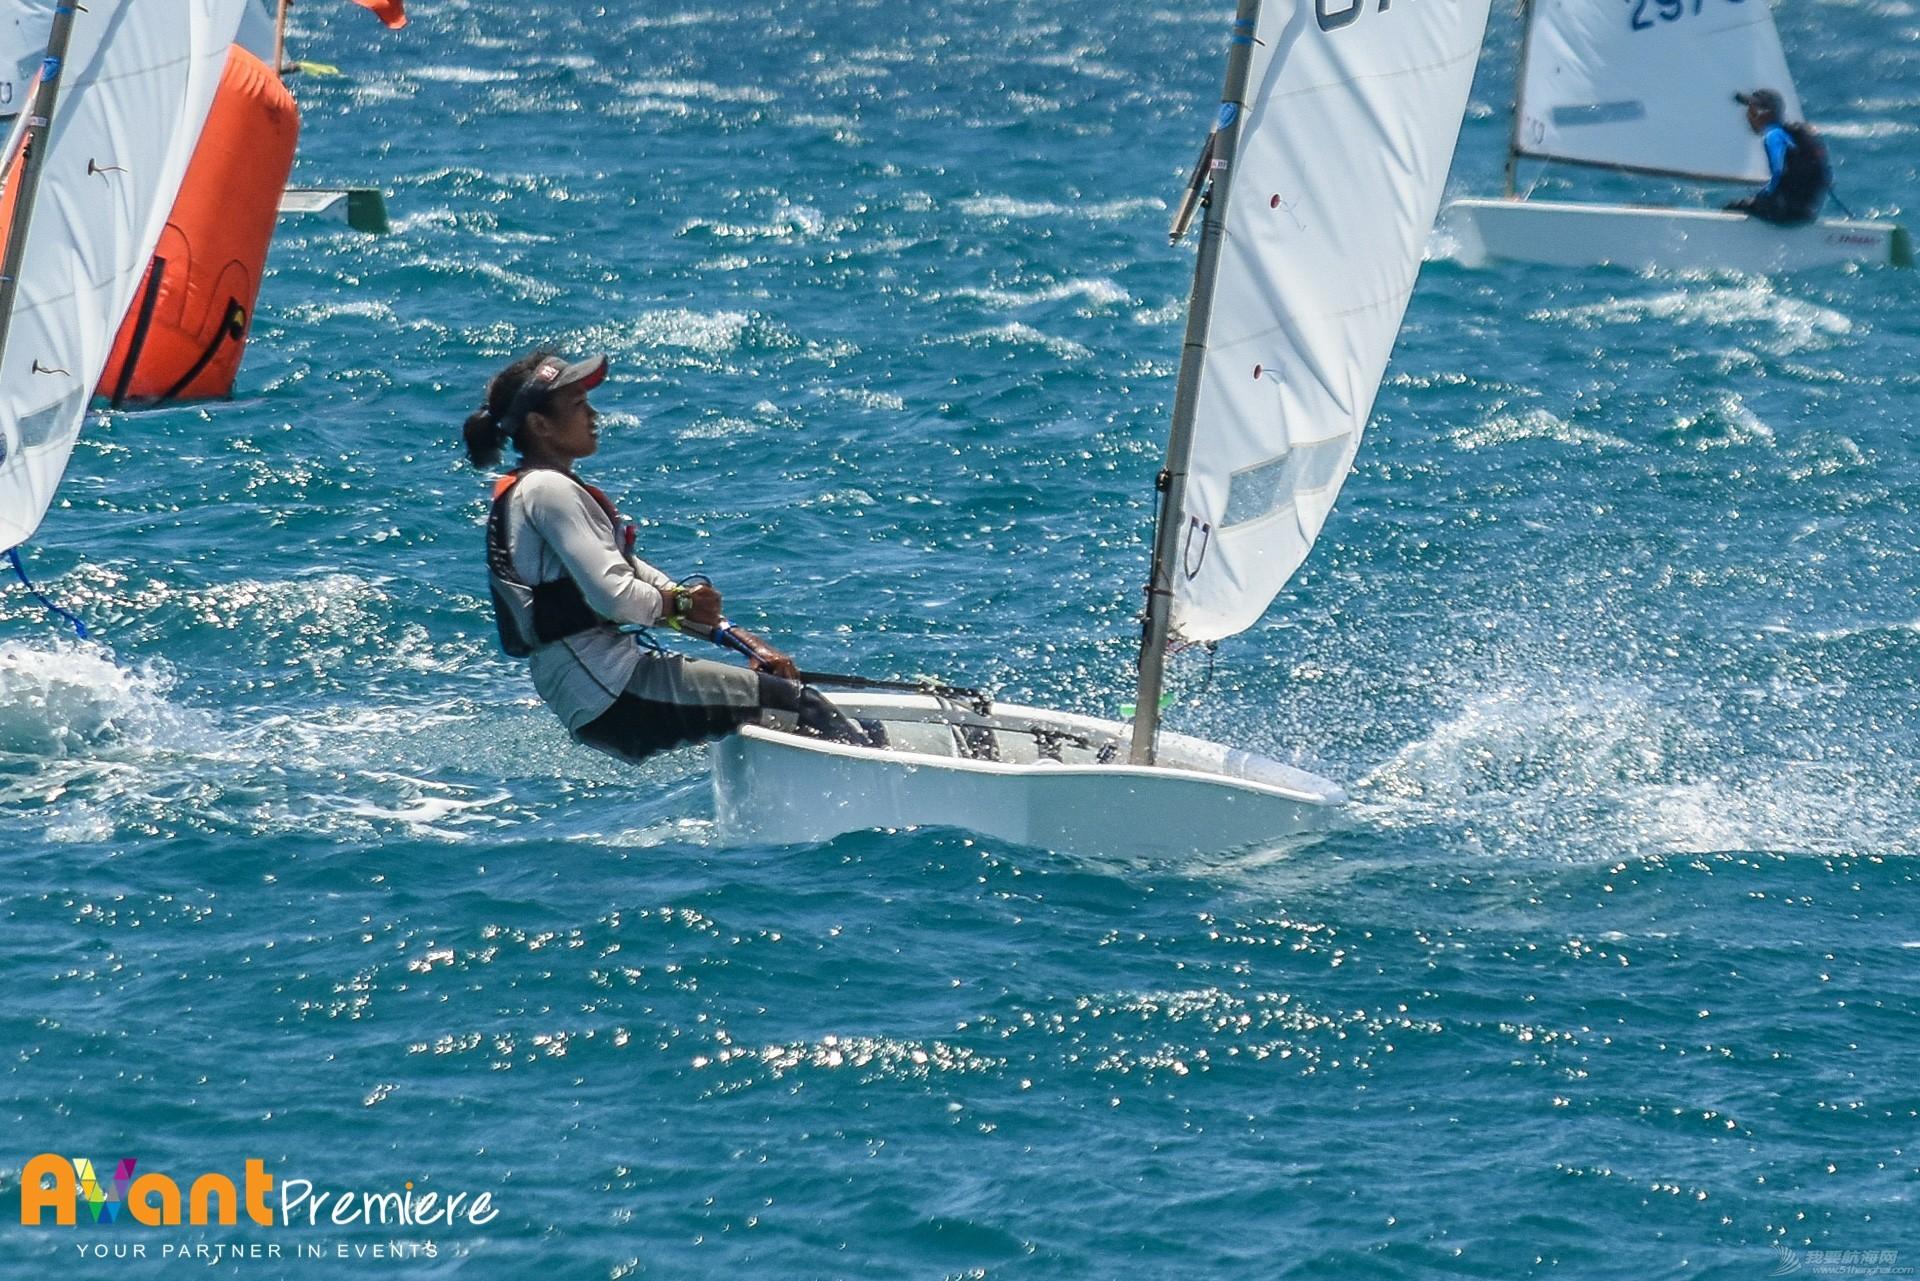 nbsp,帆船,FAREAST,提供,俱乐部 上海海尚帆友俱乐部【Shanghai Sailing Club】  155944r3z7twta2i6faib2